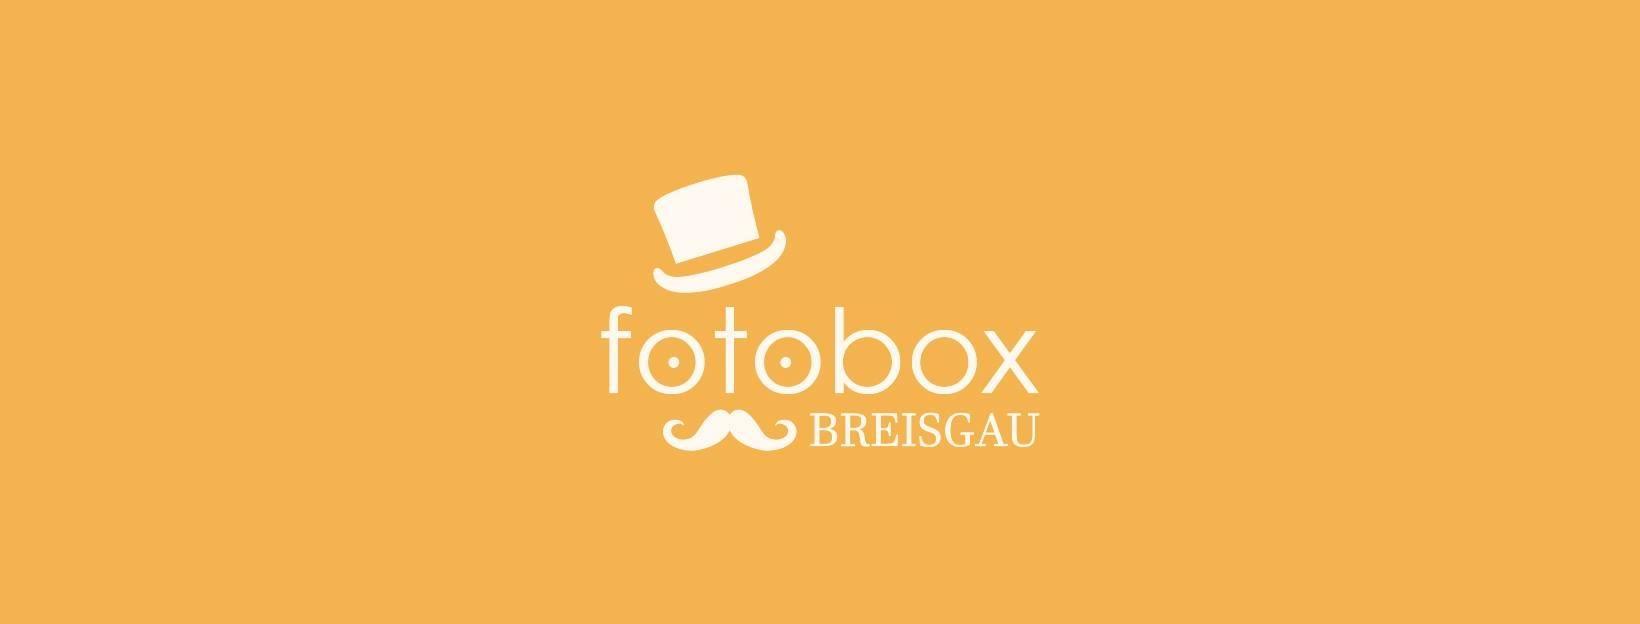 Fotobox Breisgau